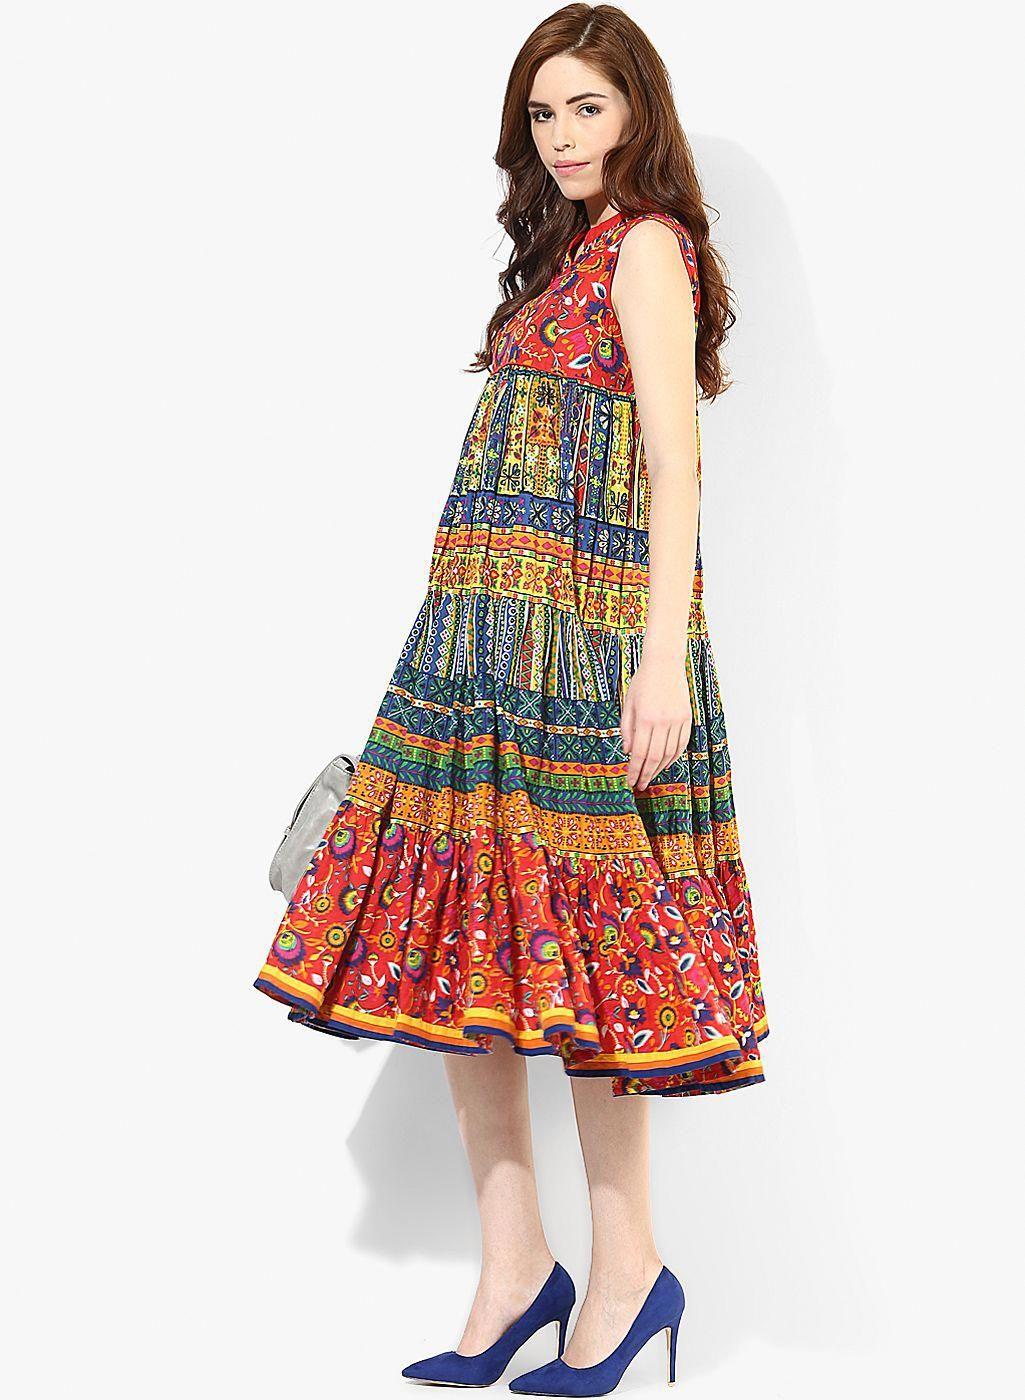 0ba19ba4f0 Buy Sangria Maxi Length Tier Sleeveless Dress for Women Online India, Best  Prices, Reviews | SA038WA29HECINDFAS #WomenClothingBrands